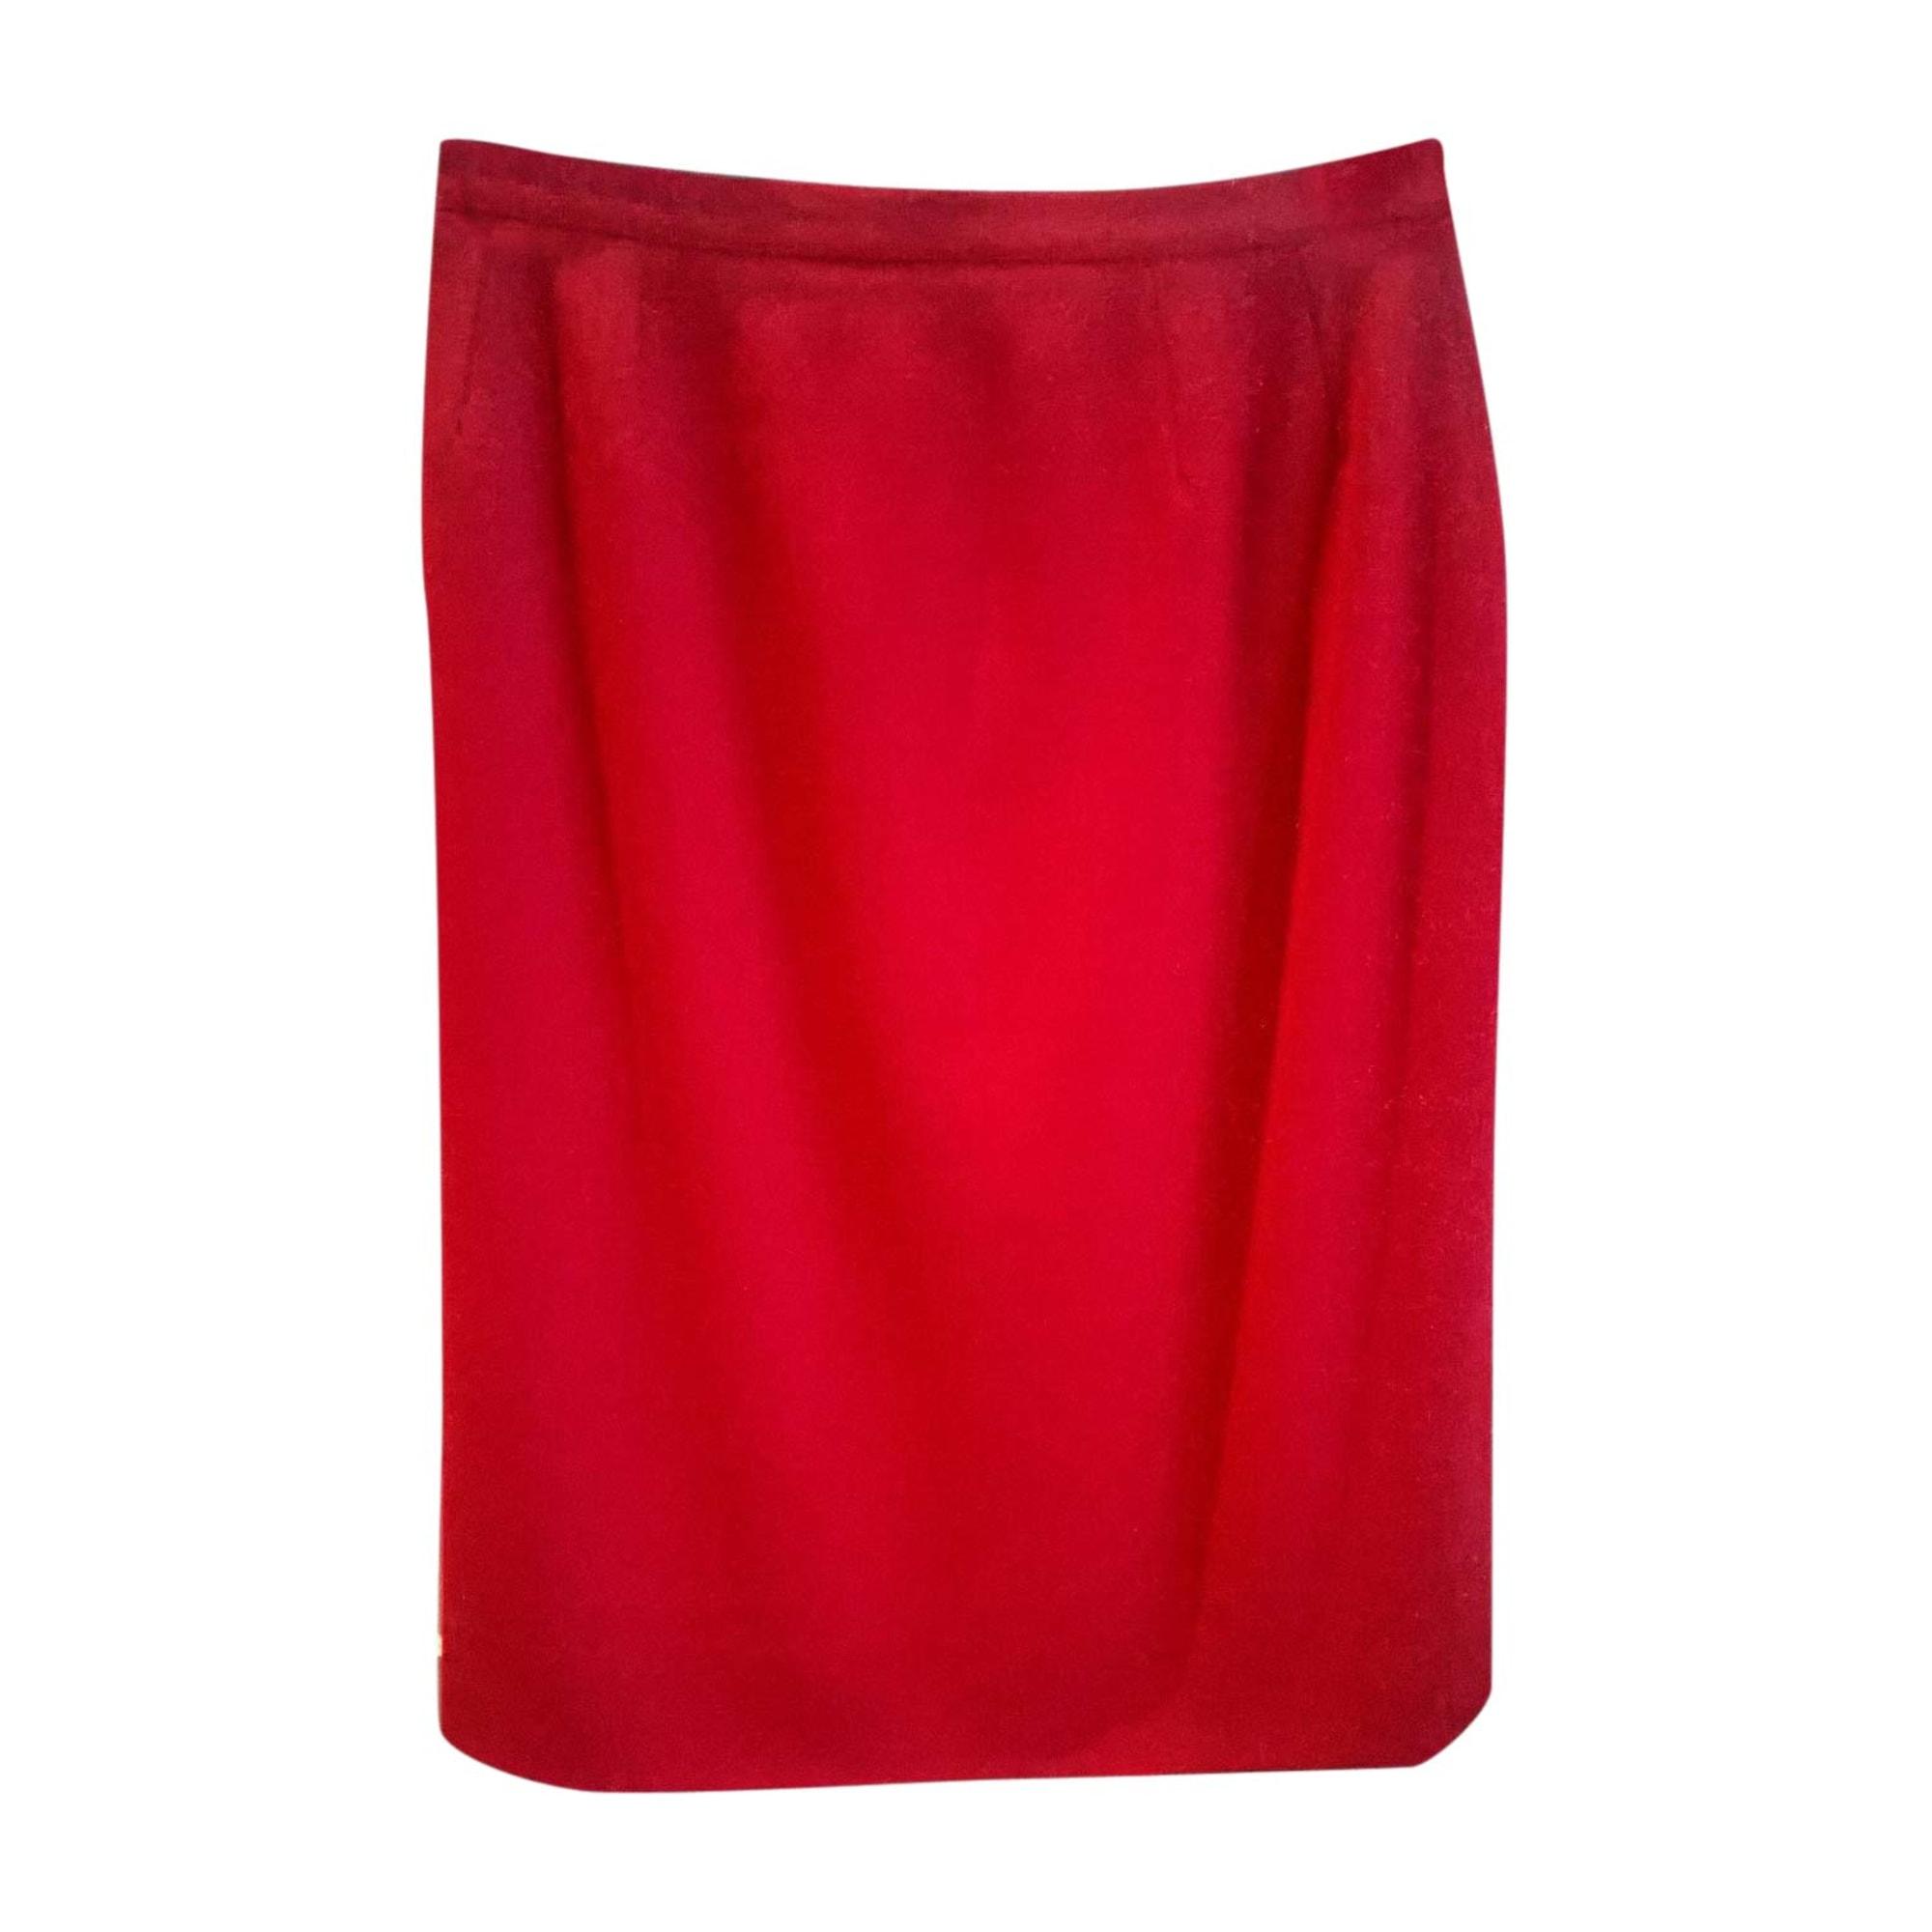 Jupe mi-longue KARL LAGERFELD Rouge, bordeaux